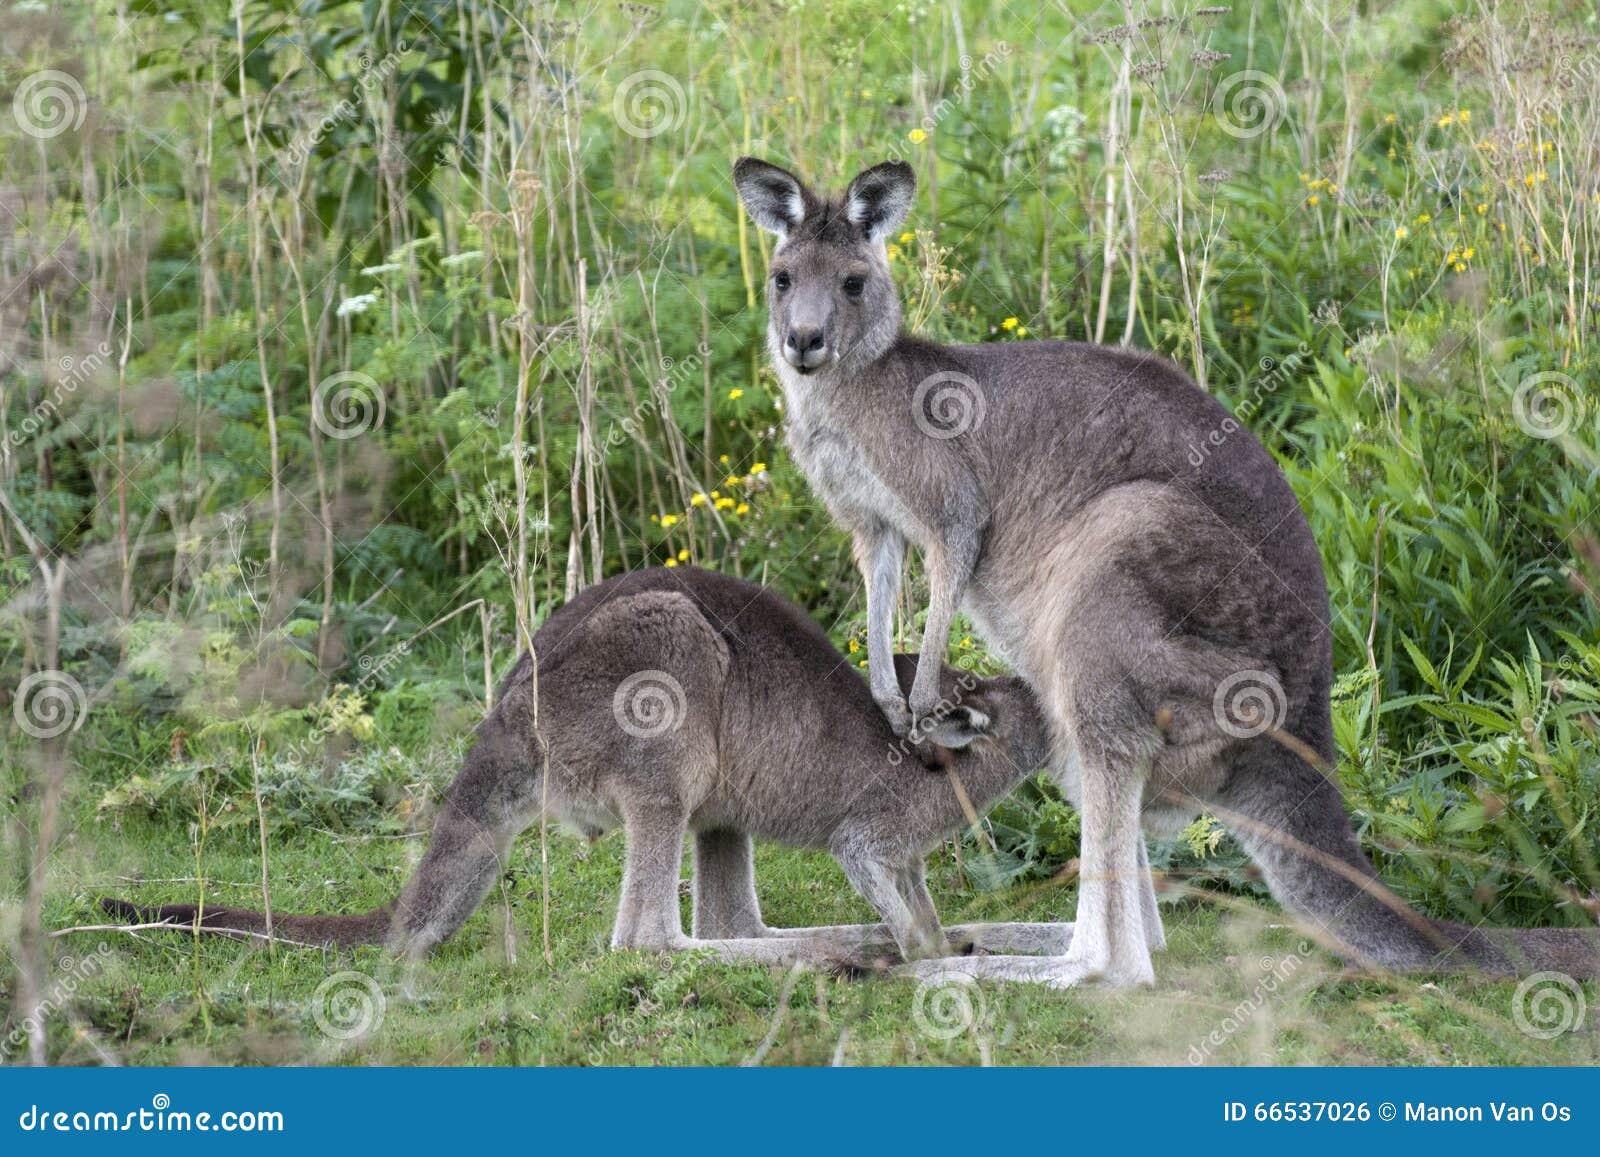 Kangaroo with little joey in Australia